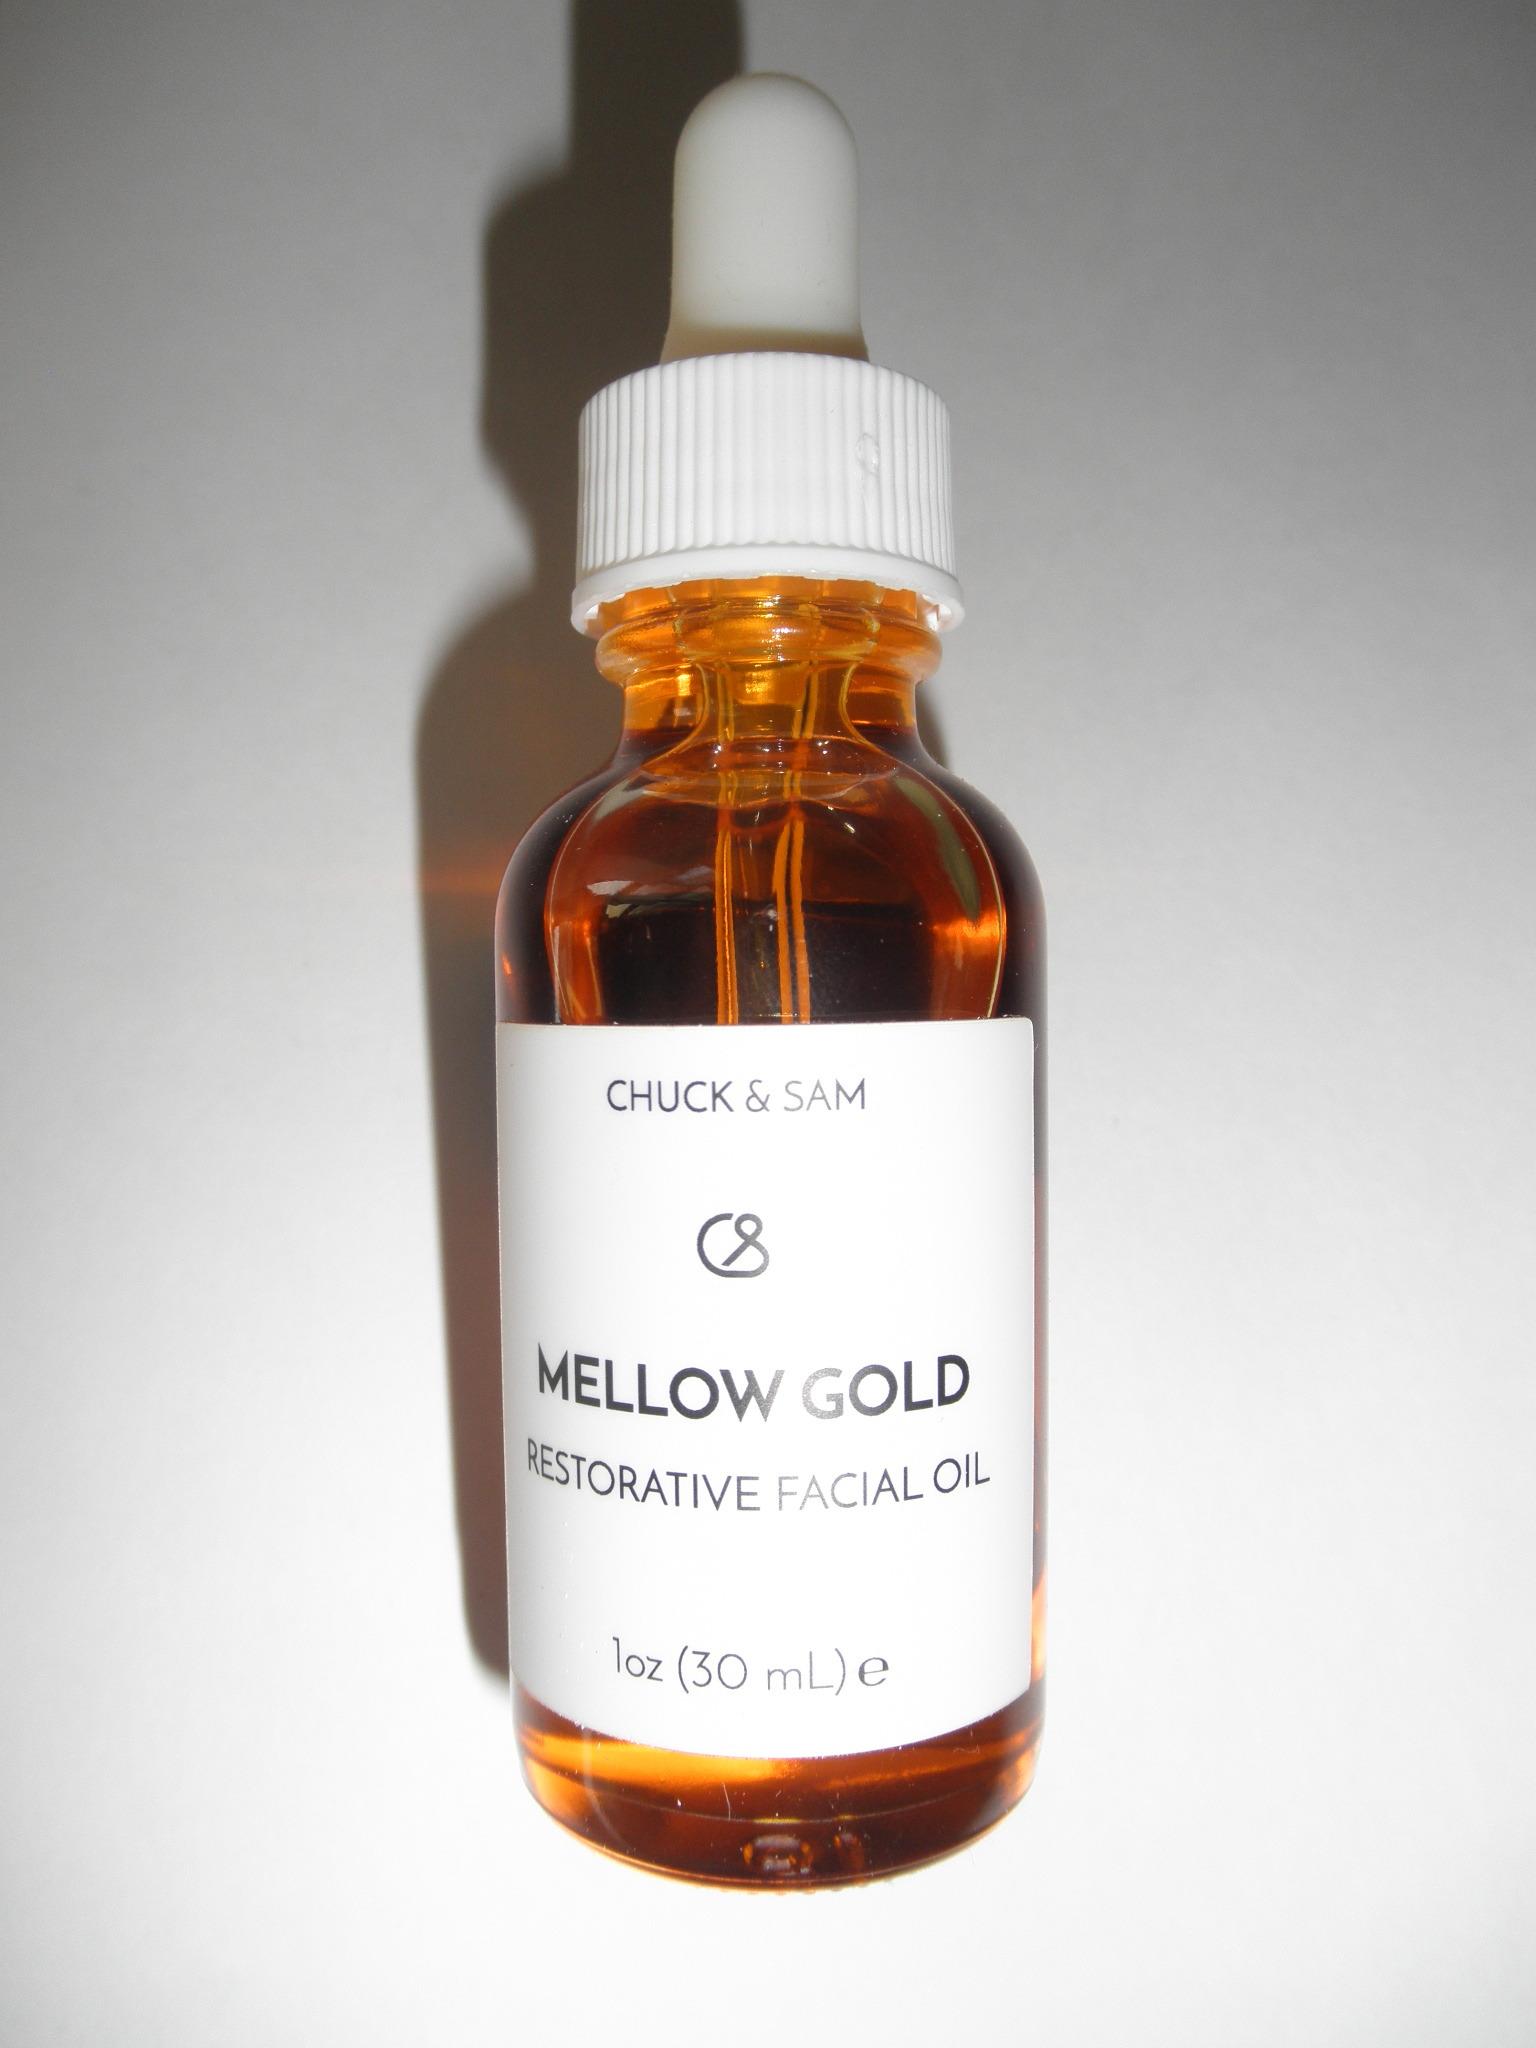 Chuck & Sam - Mellow Gold Restorative Facial Oil -